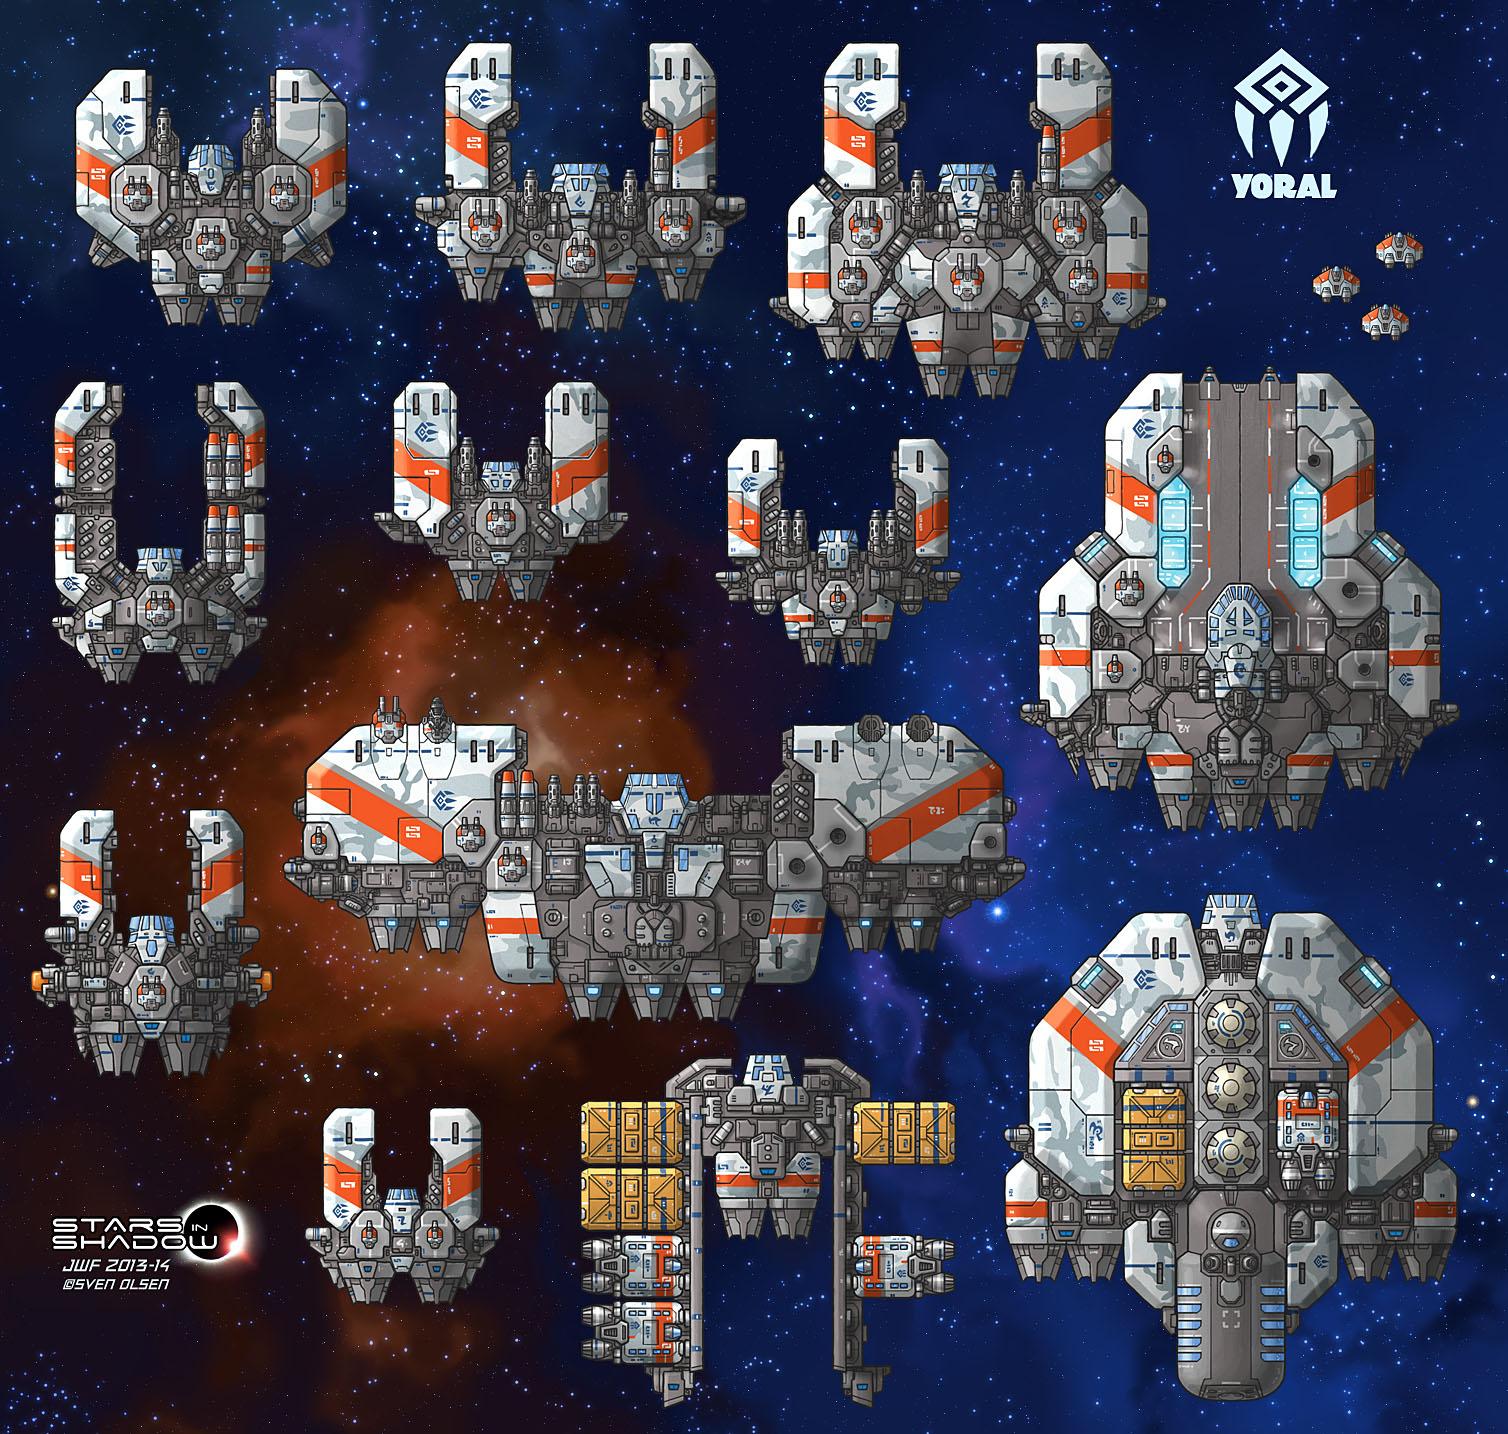 Stars in Shadow: Yoral Ships by AriochIV